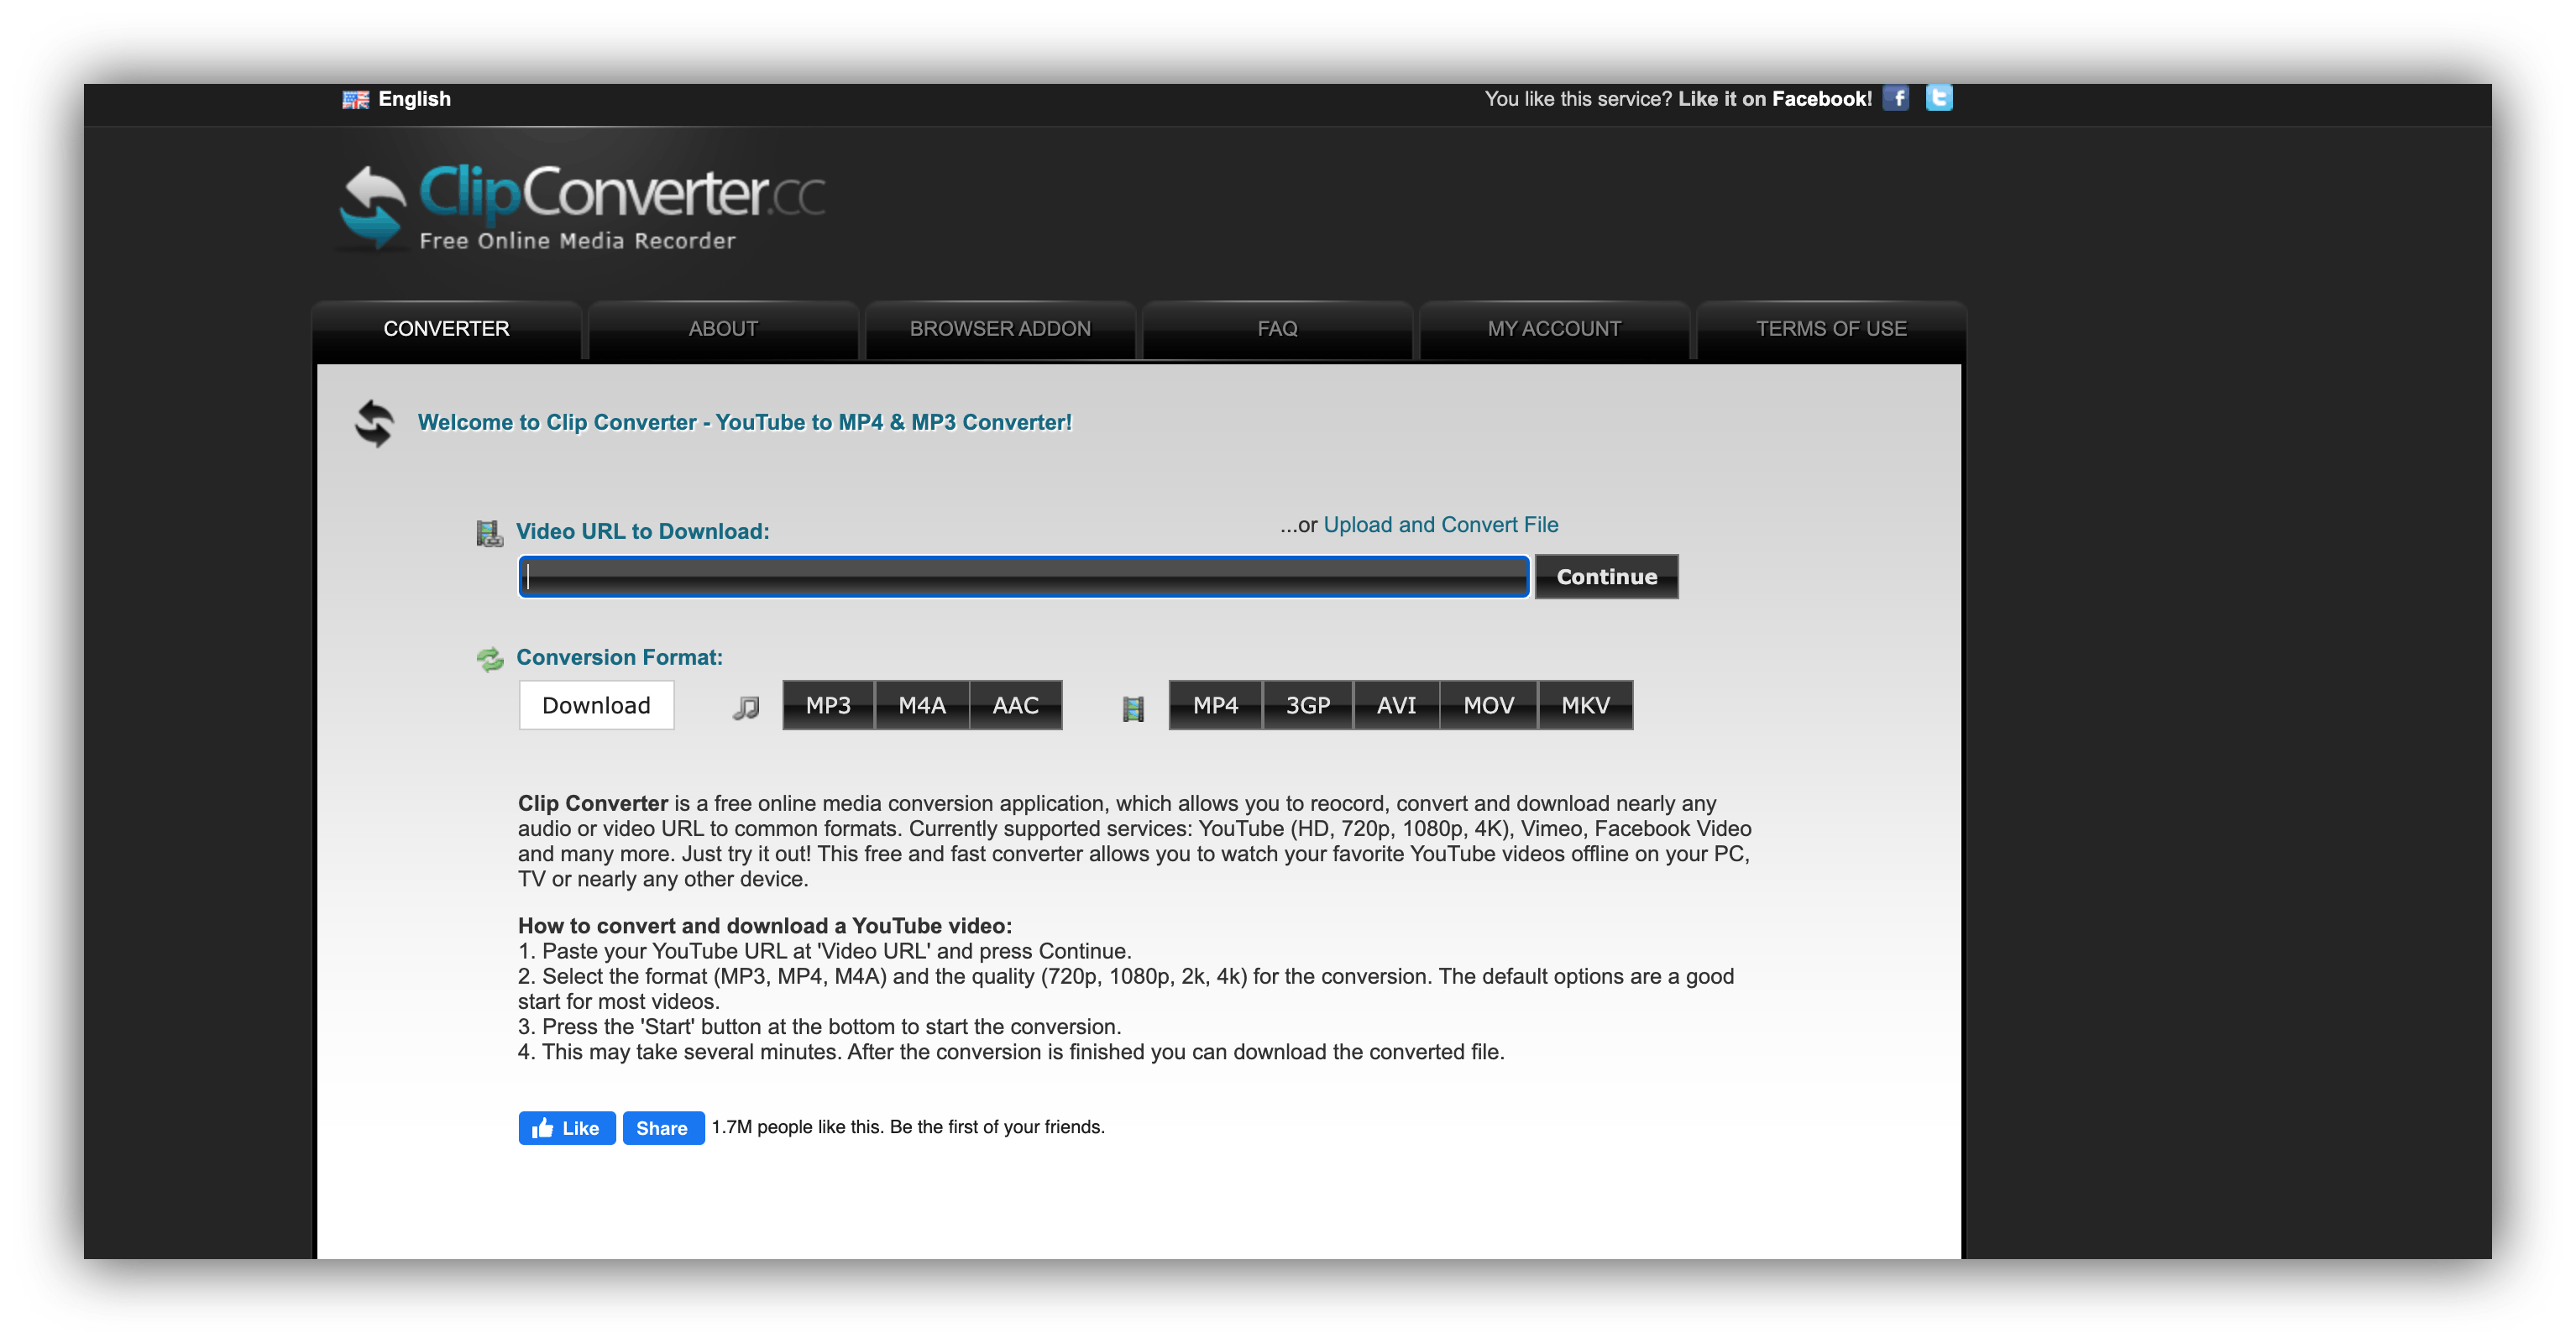 clipconverter homepage